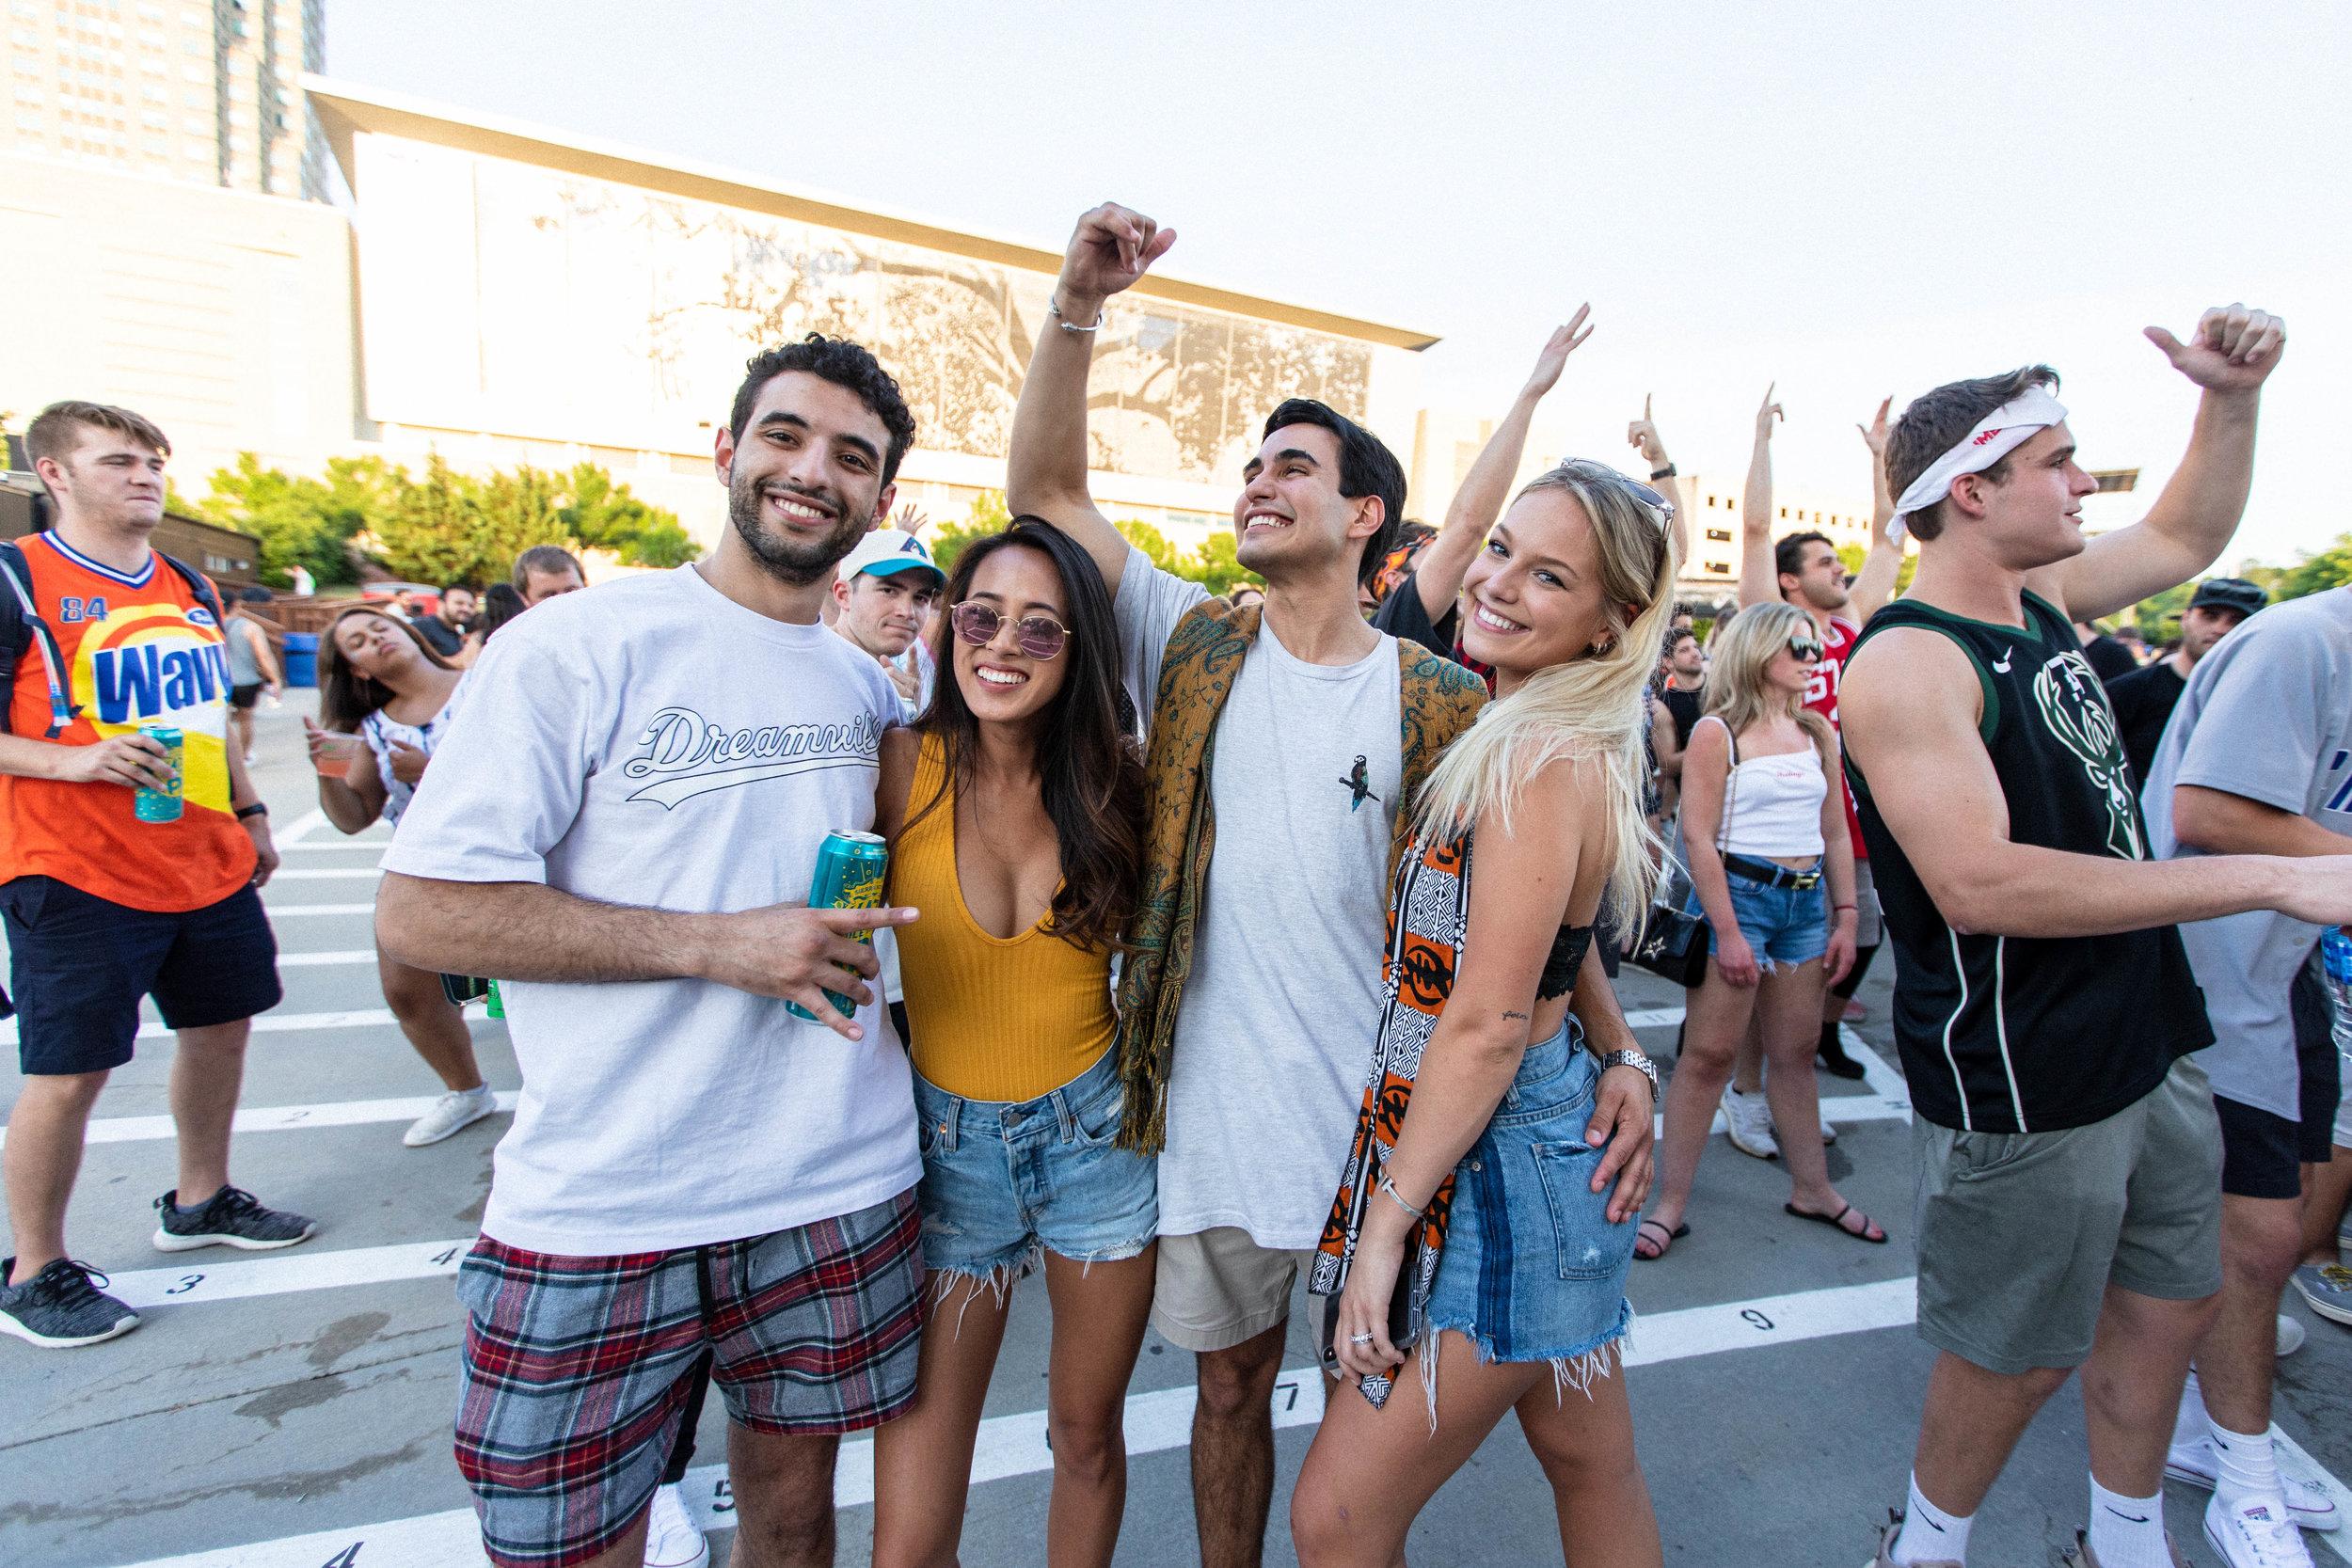 Poulos_PrimeFestival_2019_General-14.jpg